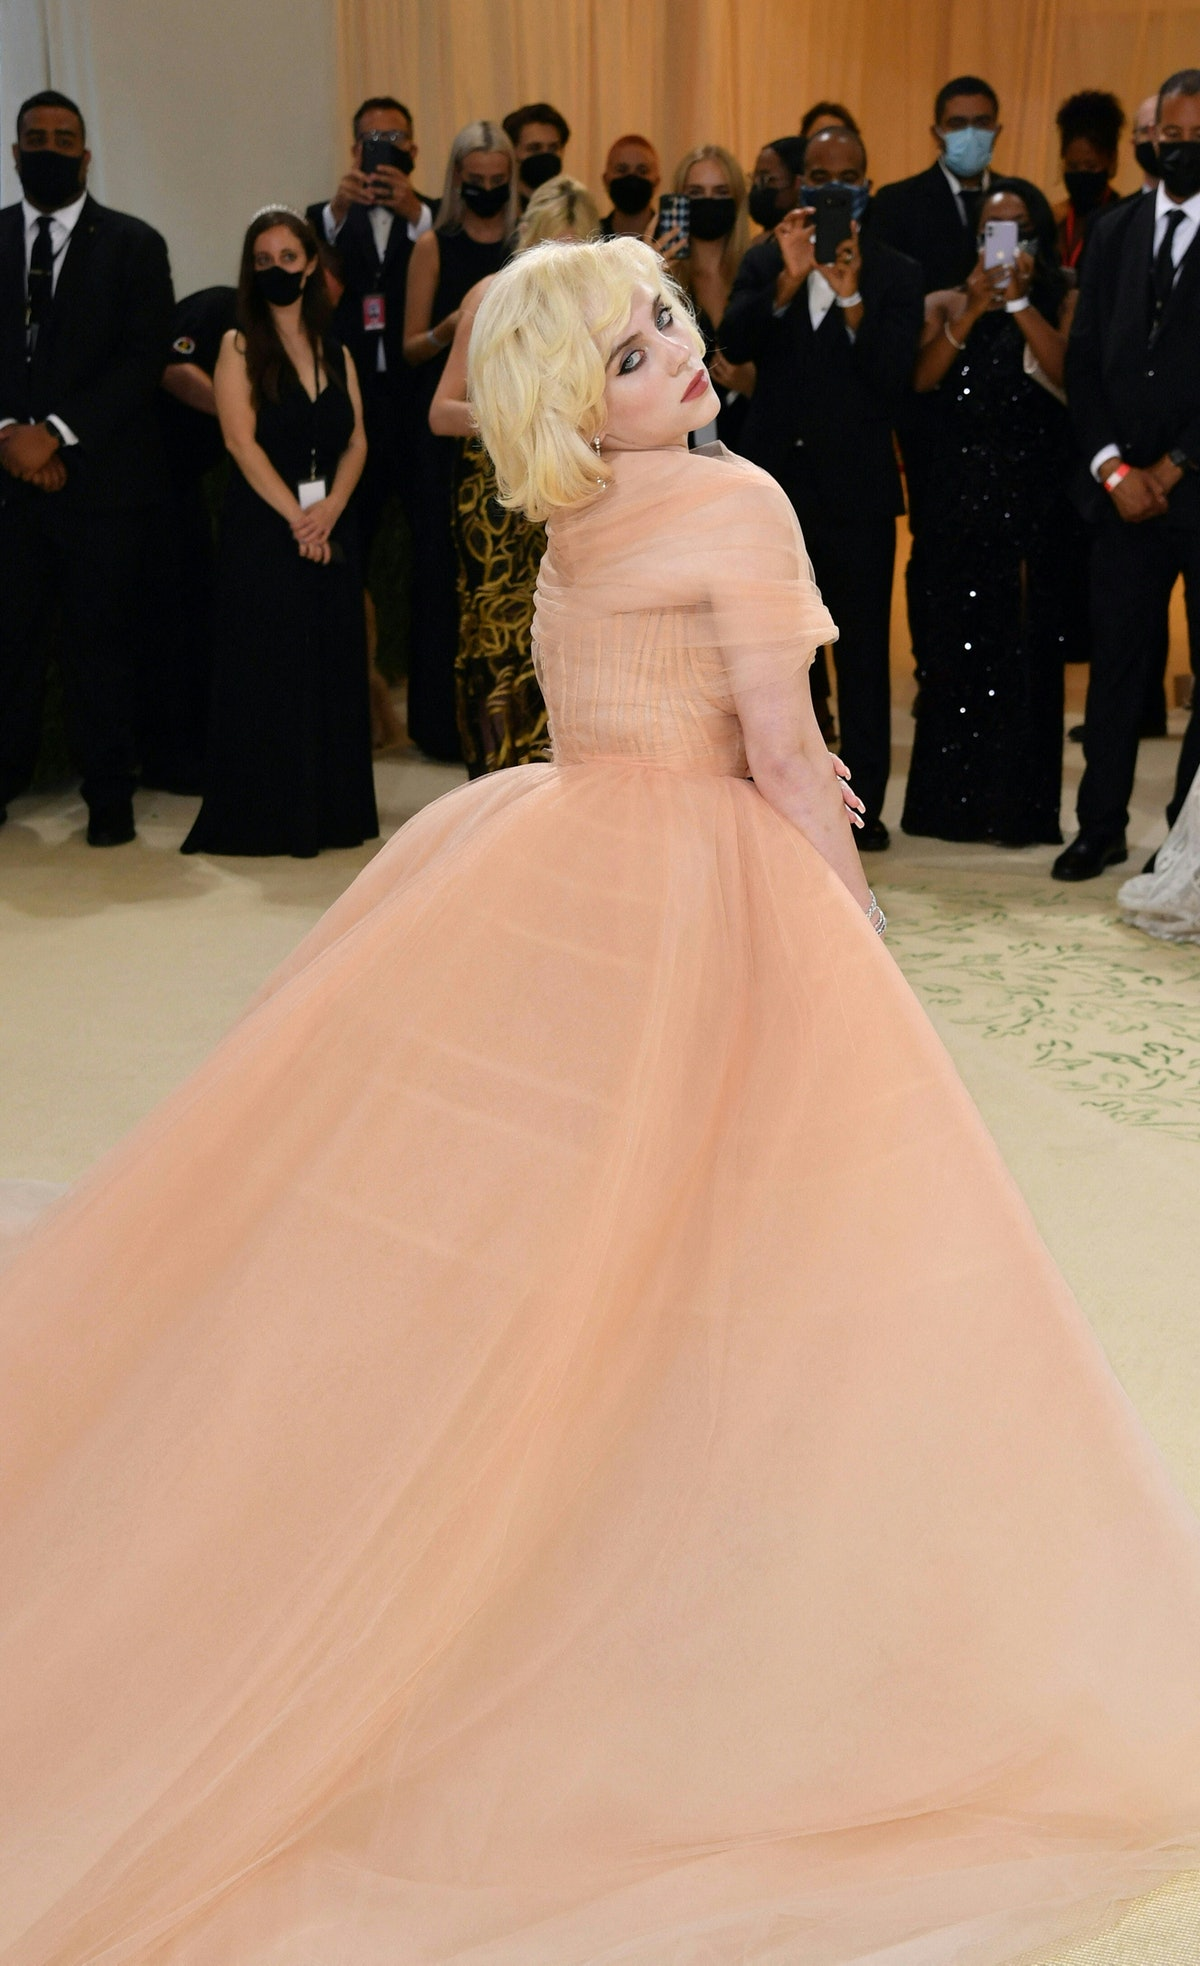 US singer/songwriter Billie Eilish arrives for the 2021 Met Gala at the Metropolitan Museum of Art o...